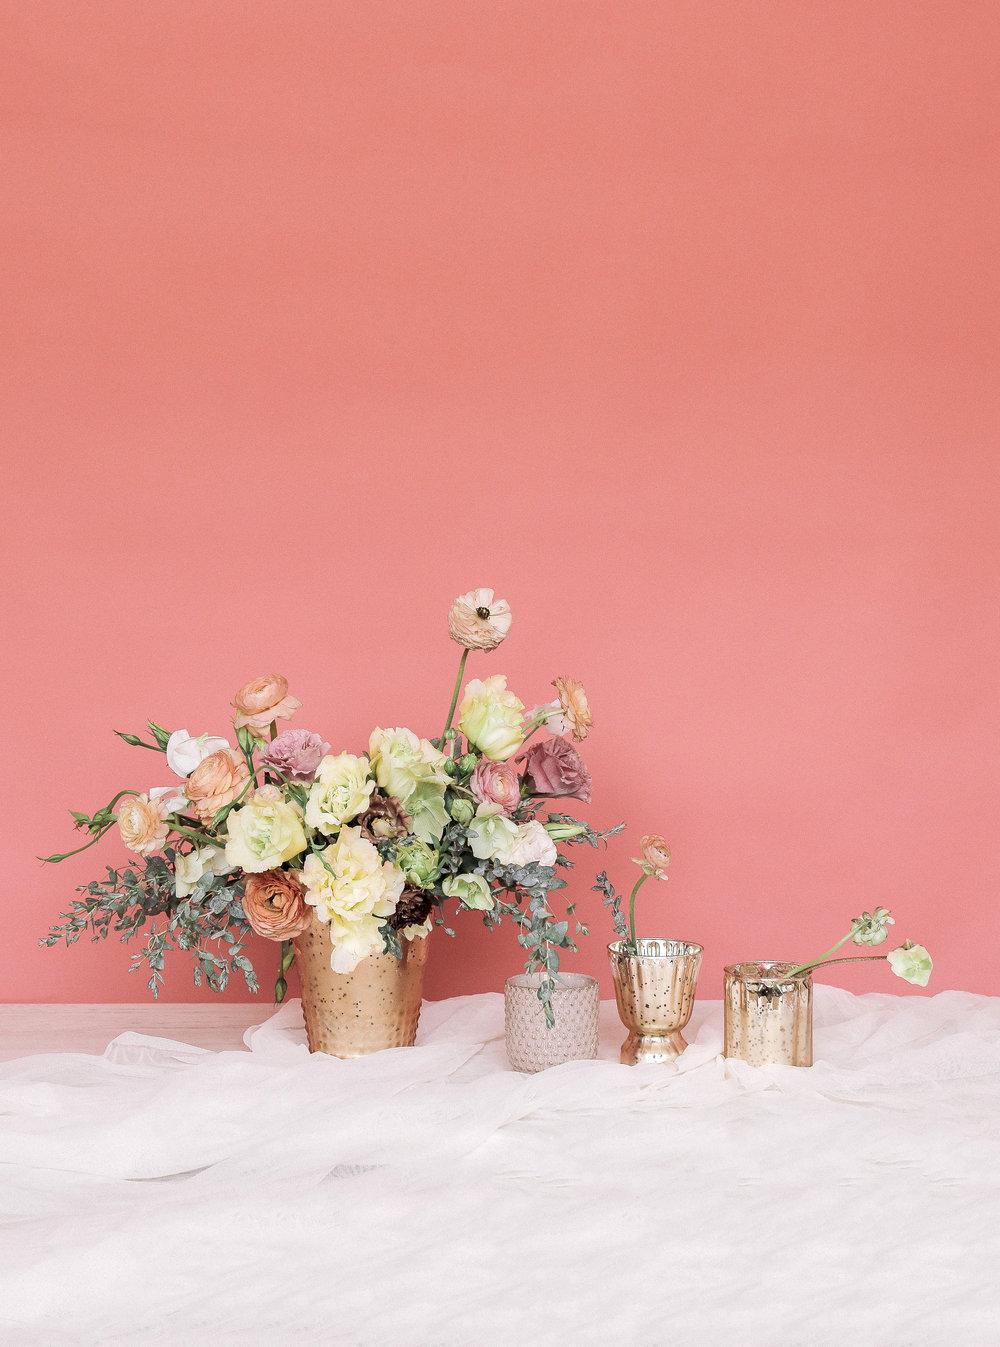 Bhldn-floral-color-story-Alandra-Michelle-11.jpg